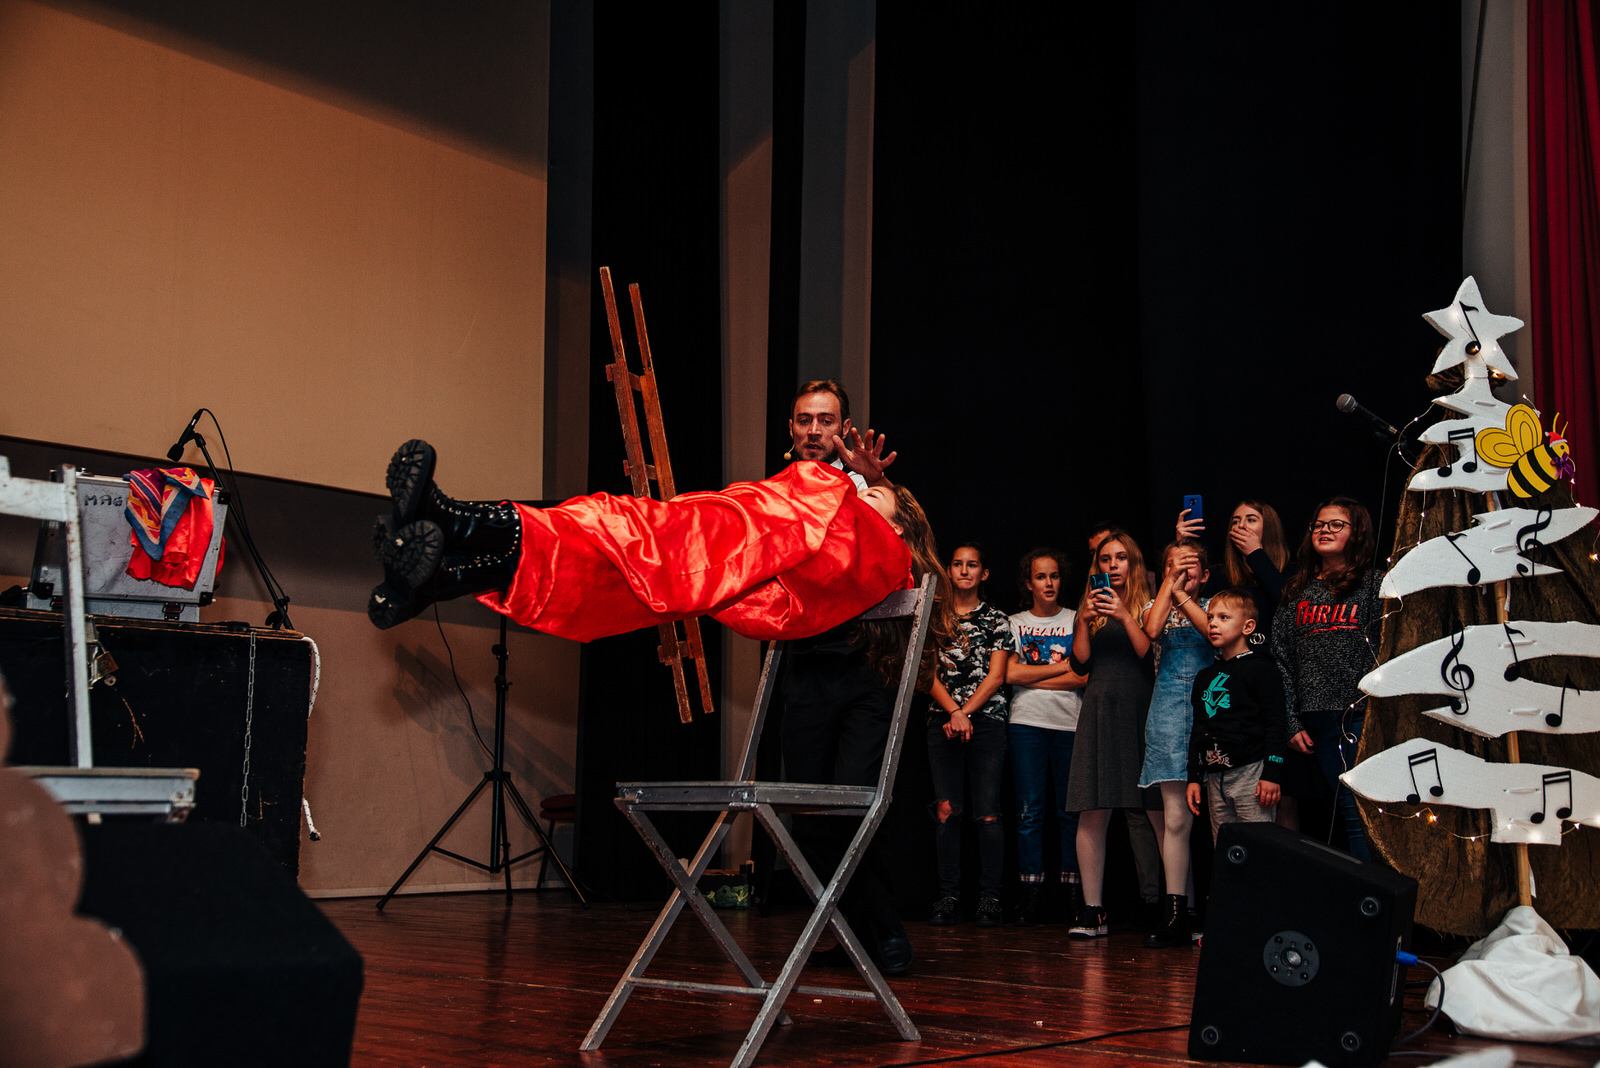 LIKACLUB_Najljepši-glas-za-Pčelice_2019-10